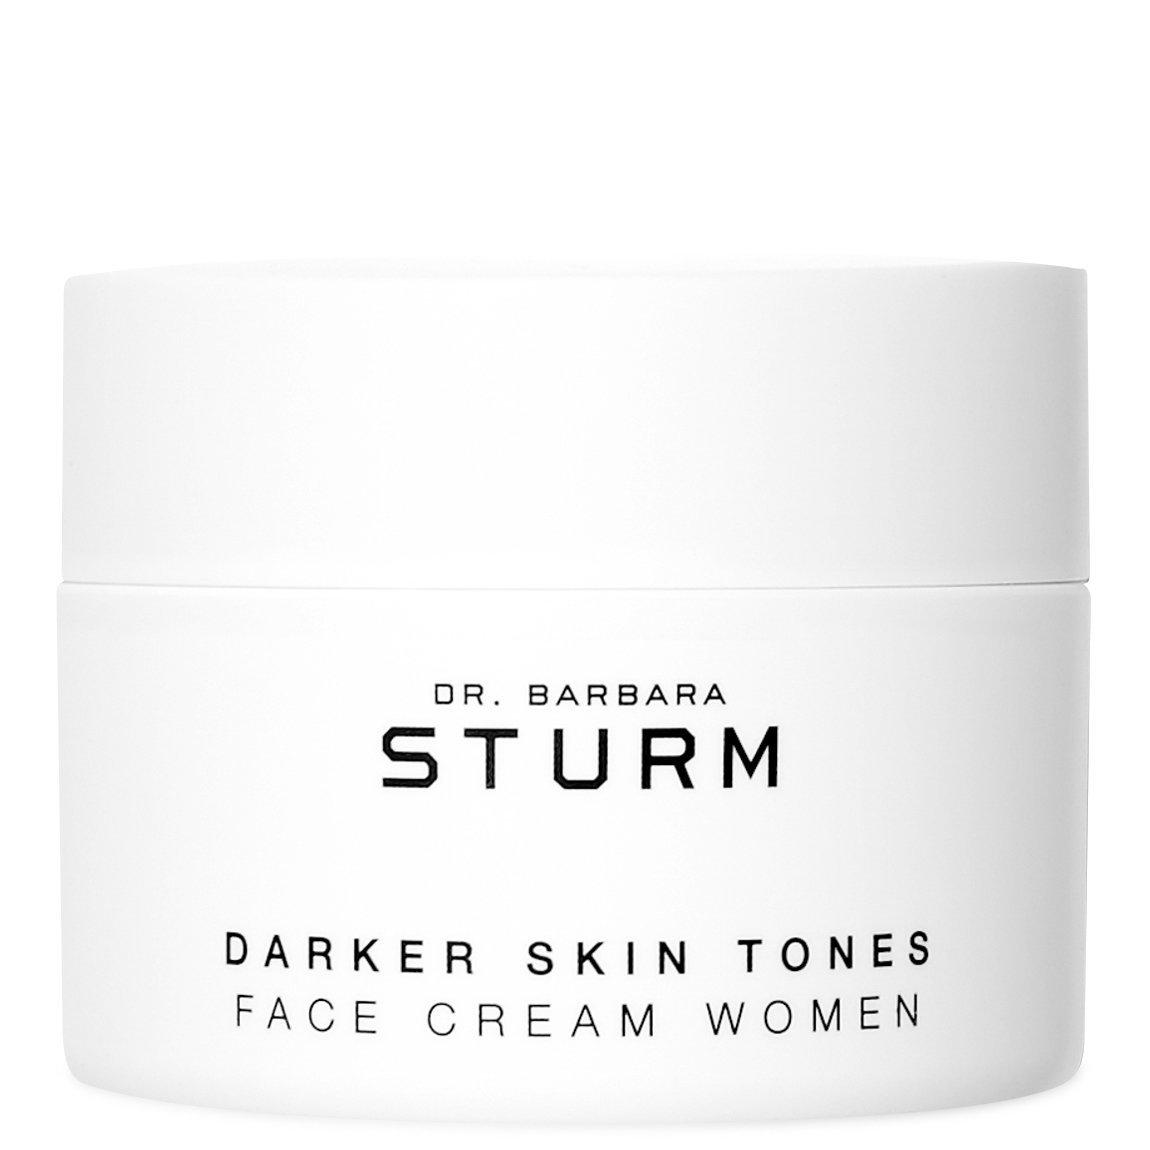 Dr. Barbara Sturm Darker Skin Tones Face Cream product swatch.